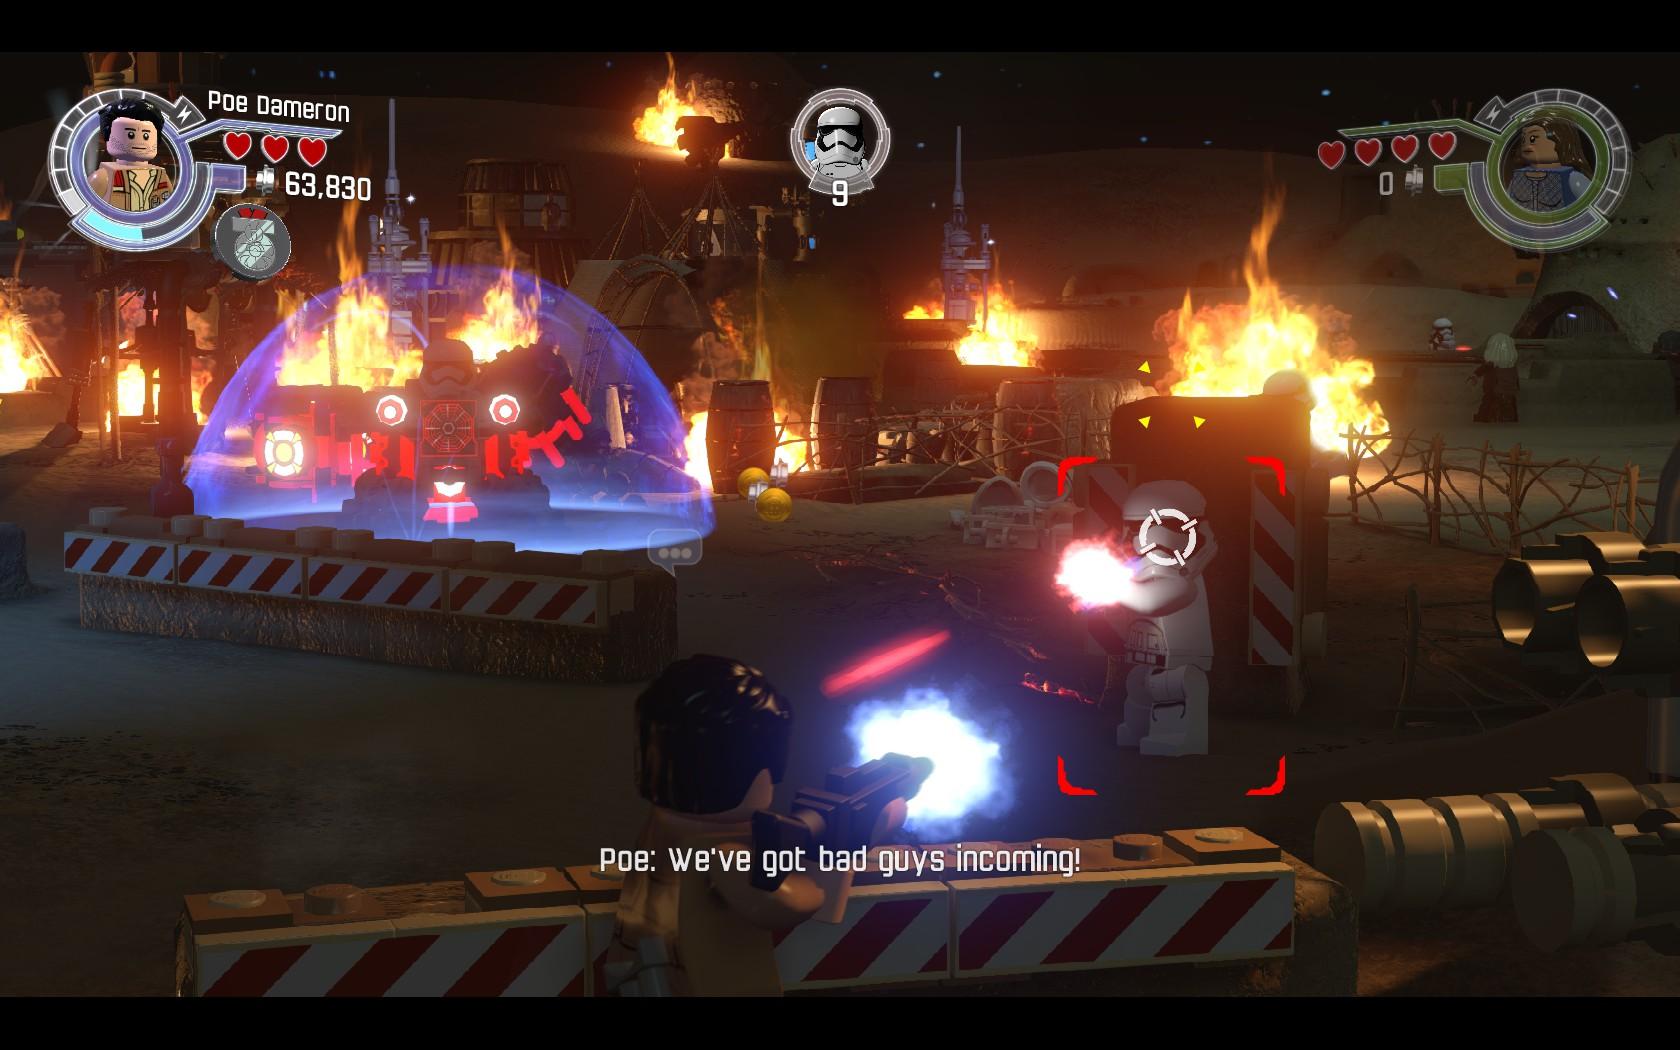 LEGO Star Wars: The Force Awakens - kostky se probouzí 126754